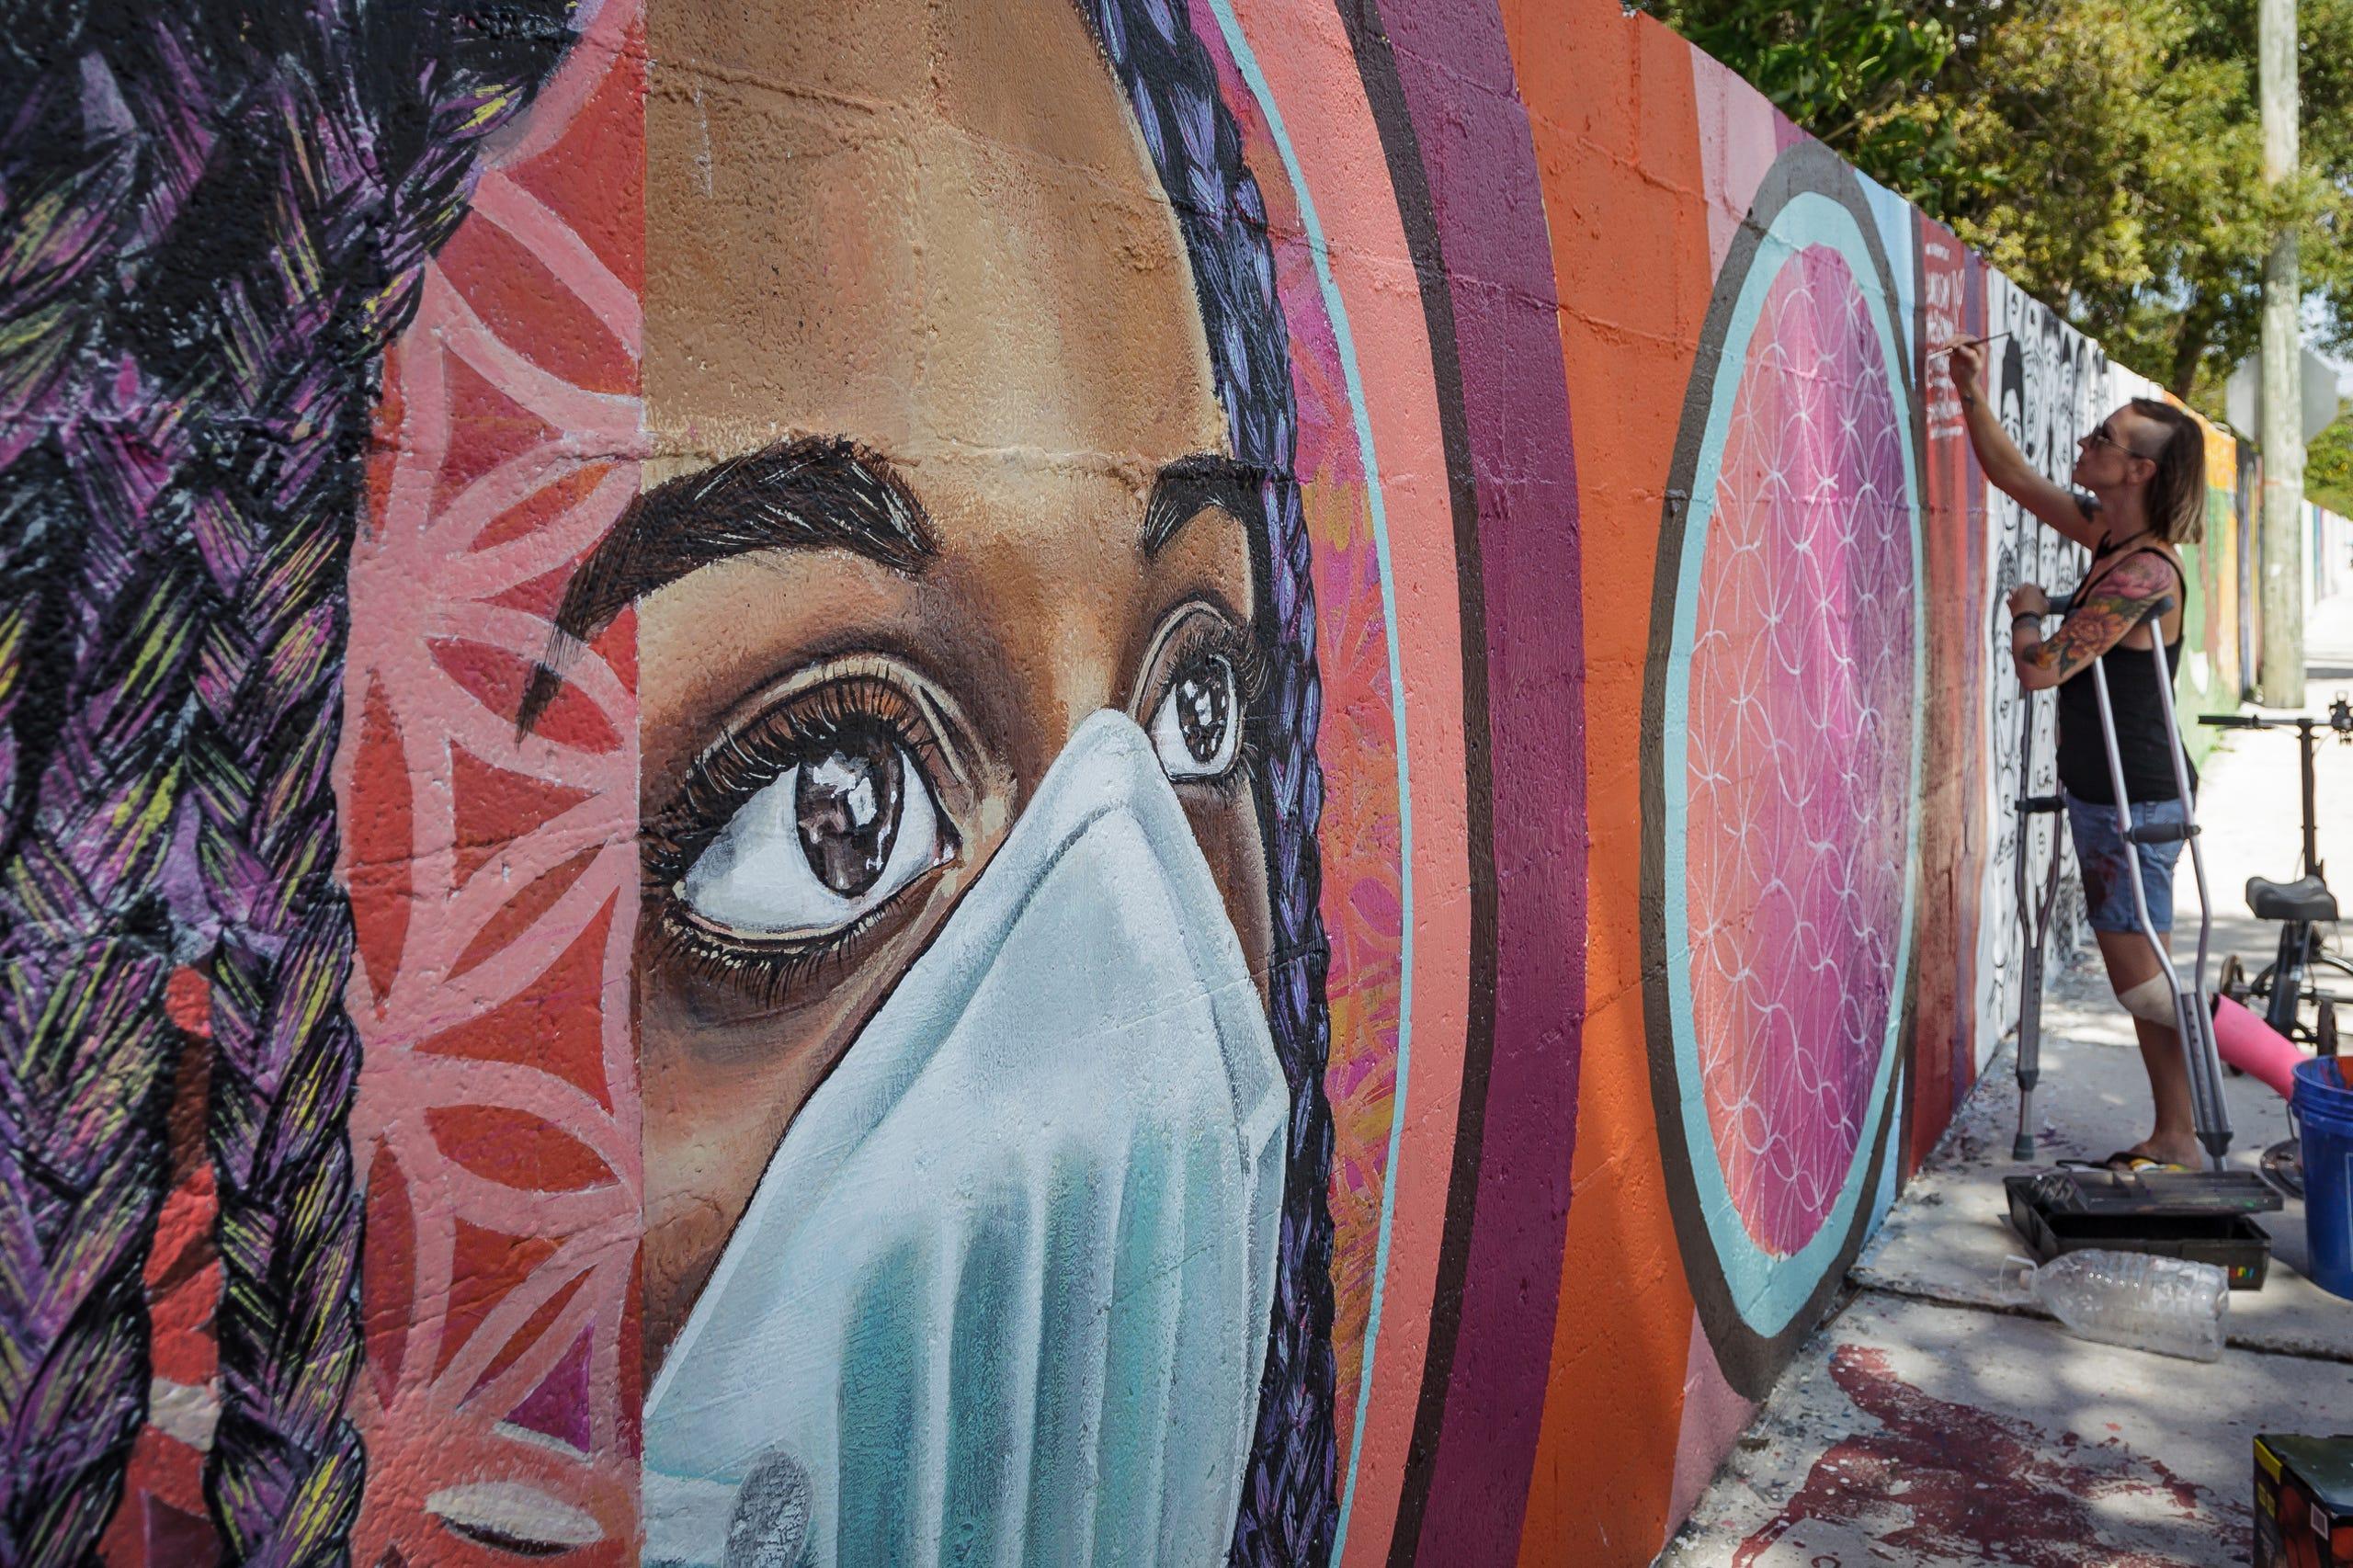 Artist Lindsay McGlynn Paints A Mural On the Lake Worth Beach Unity Wall